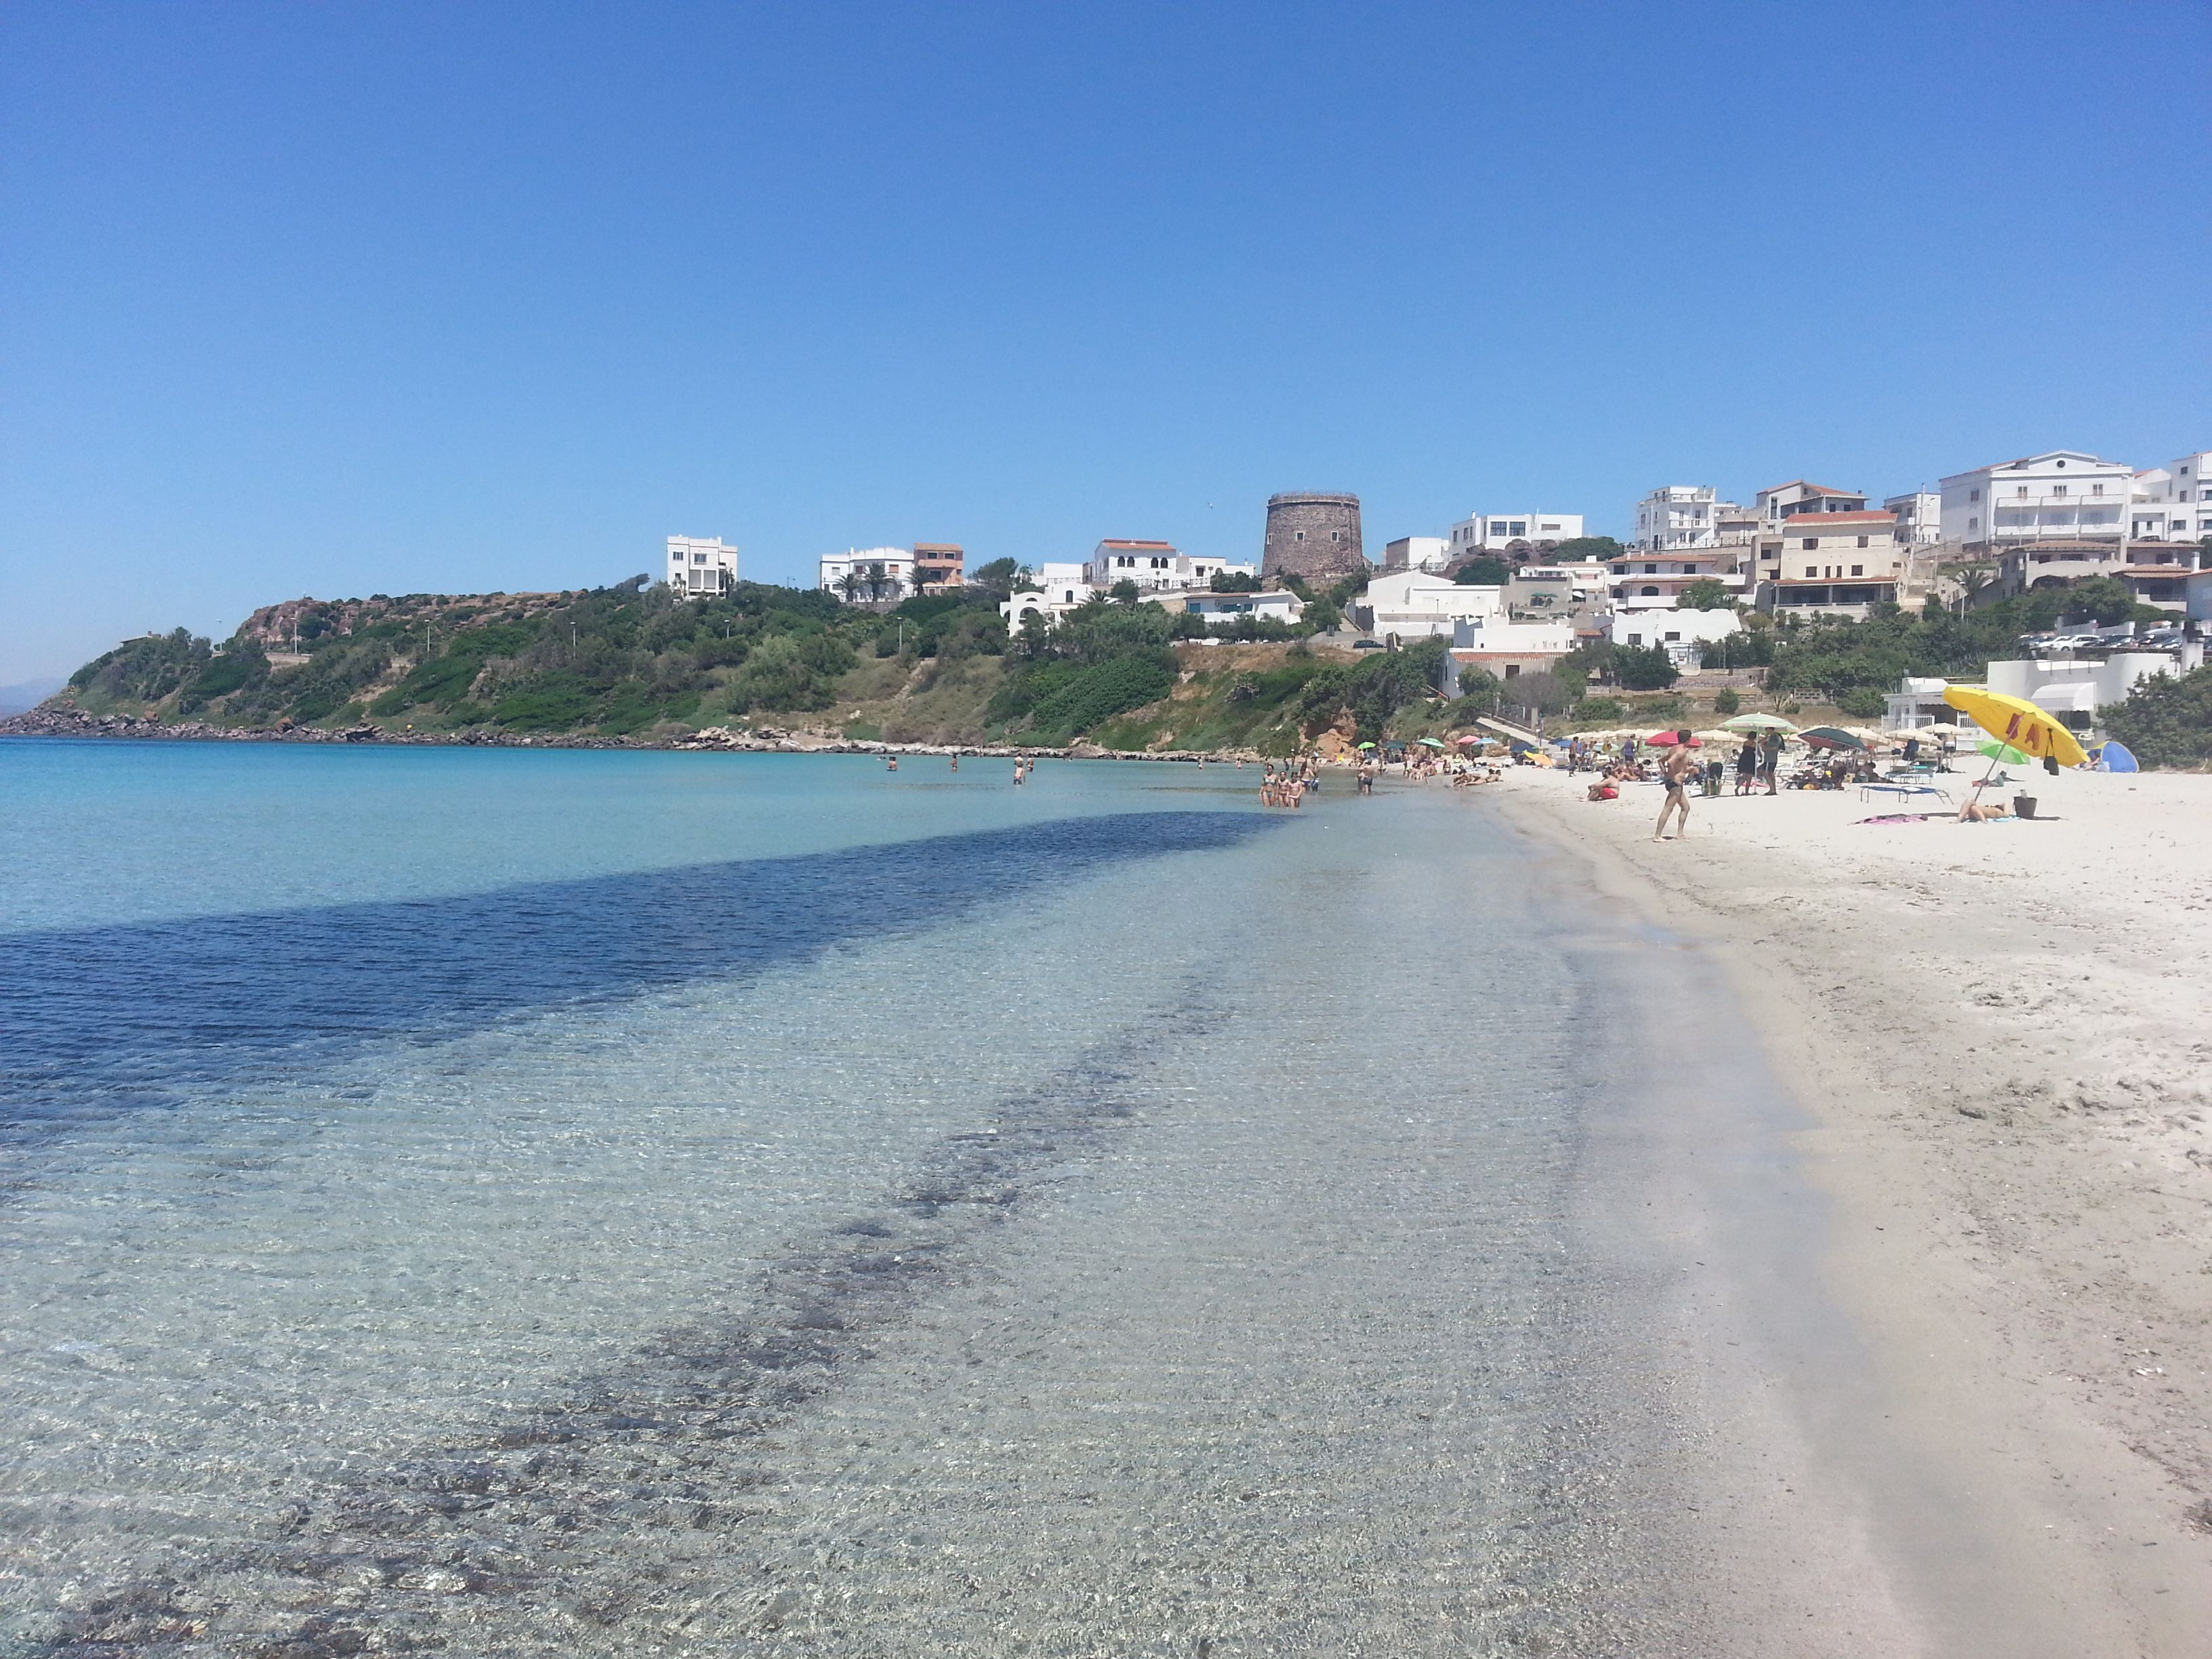 1 Spiaggia Calasetta S Antioco 3 West Coast Beaches Italia